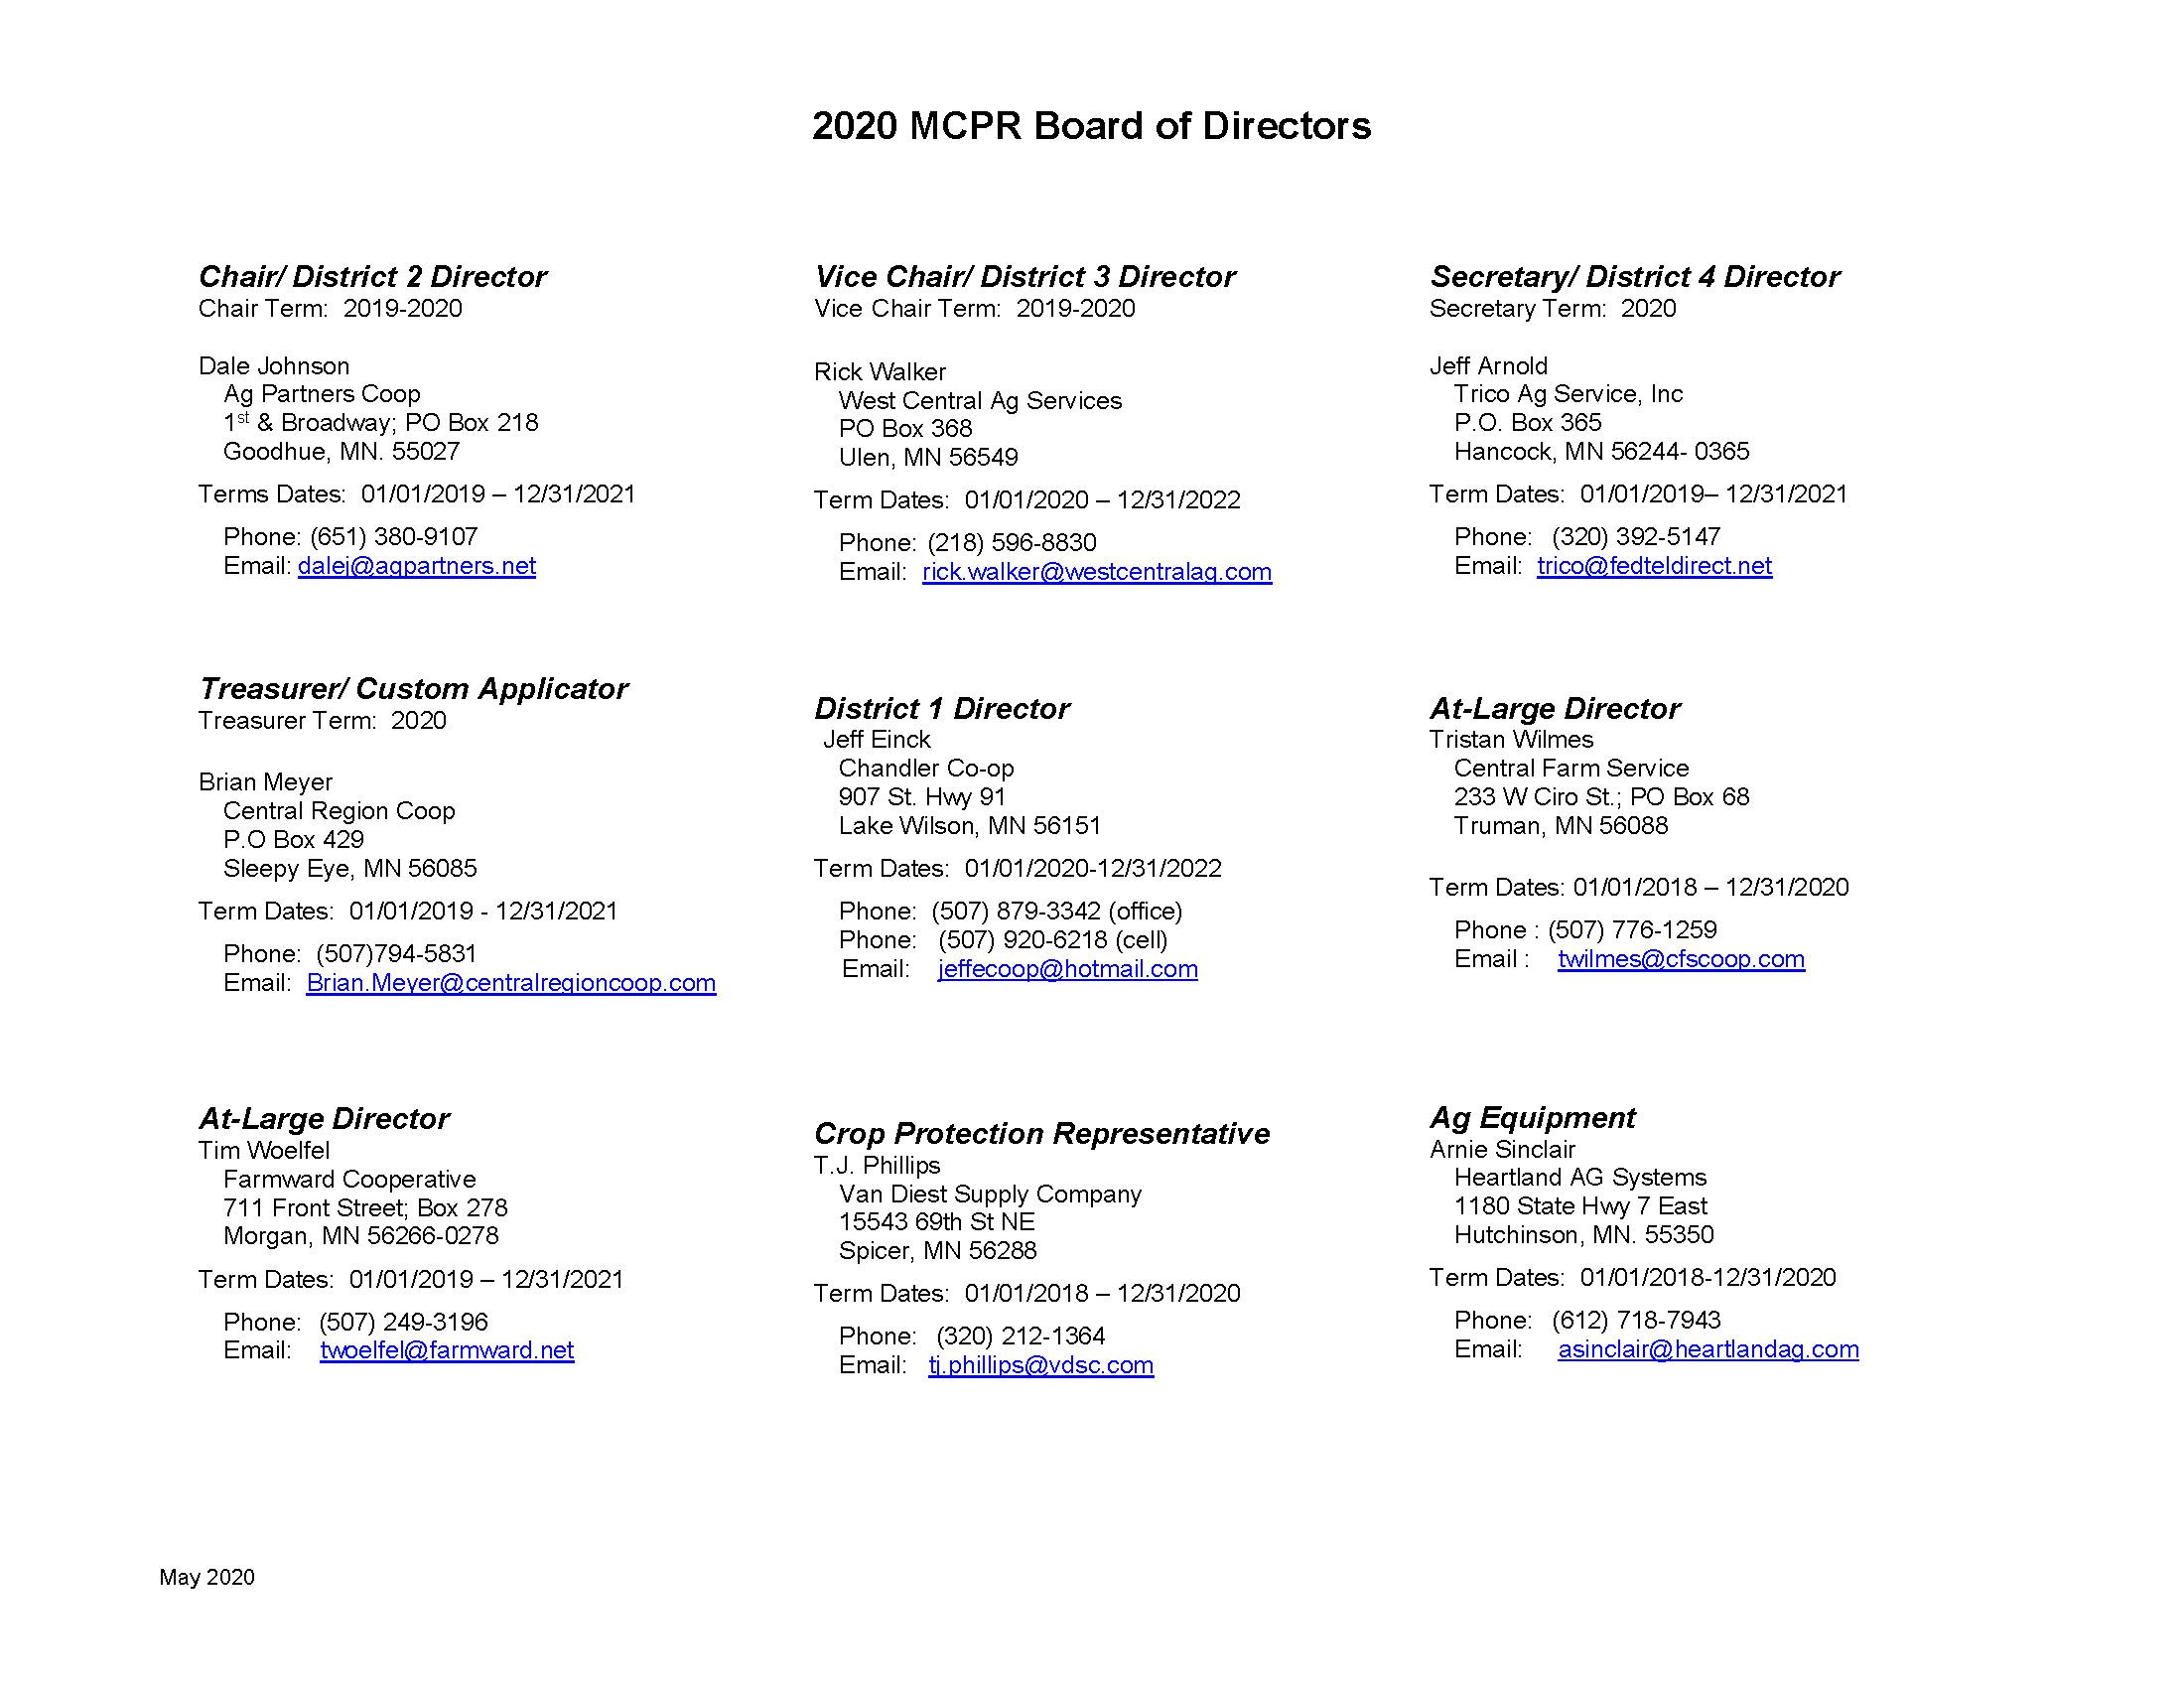 2020 MCPR Board of Directors_May2020_Page_1